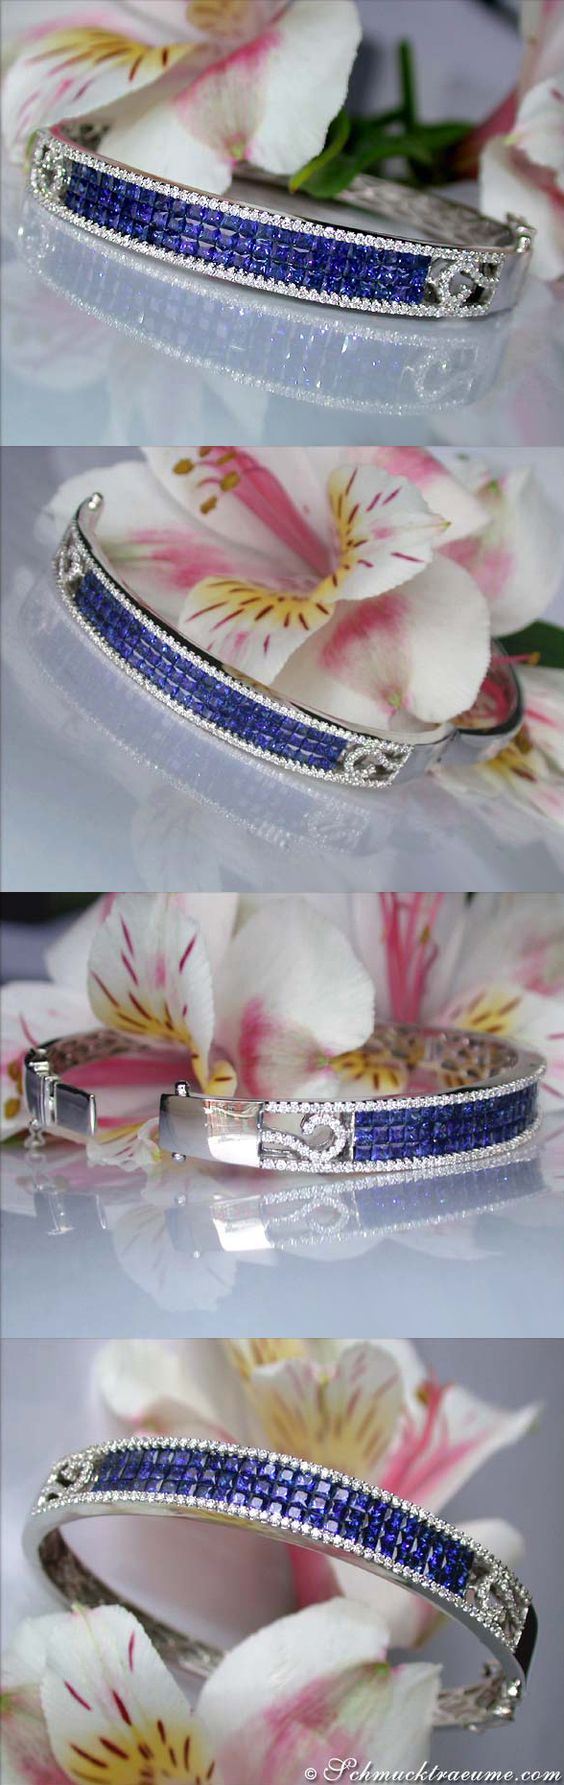 Fabulous Sapphire Diamond Bangle, 5.80 ct. WG-18K - Visit: schmucktraeume.com Like: https://www.facebook.com/pages/Noble-Juwelen/150871984924926